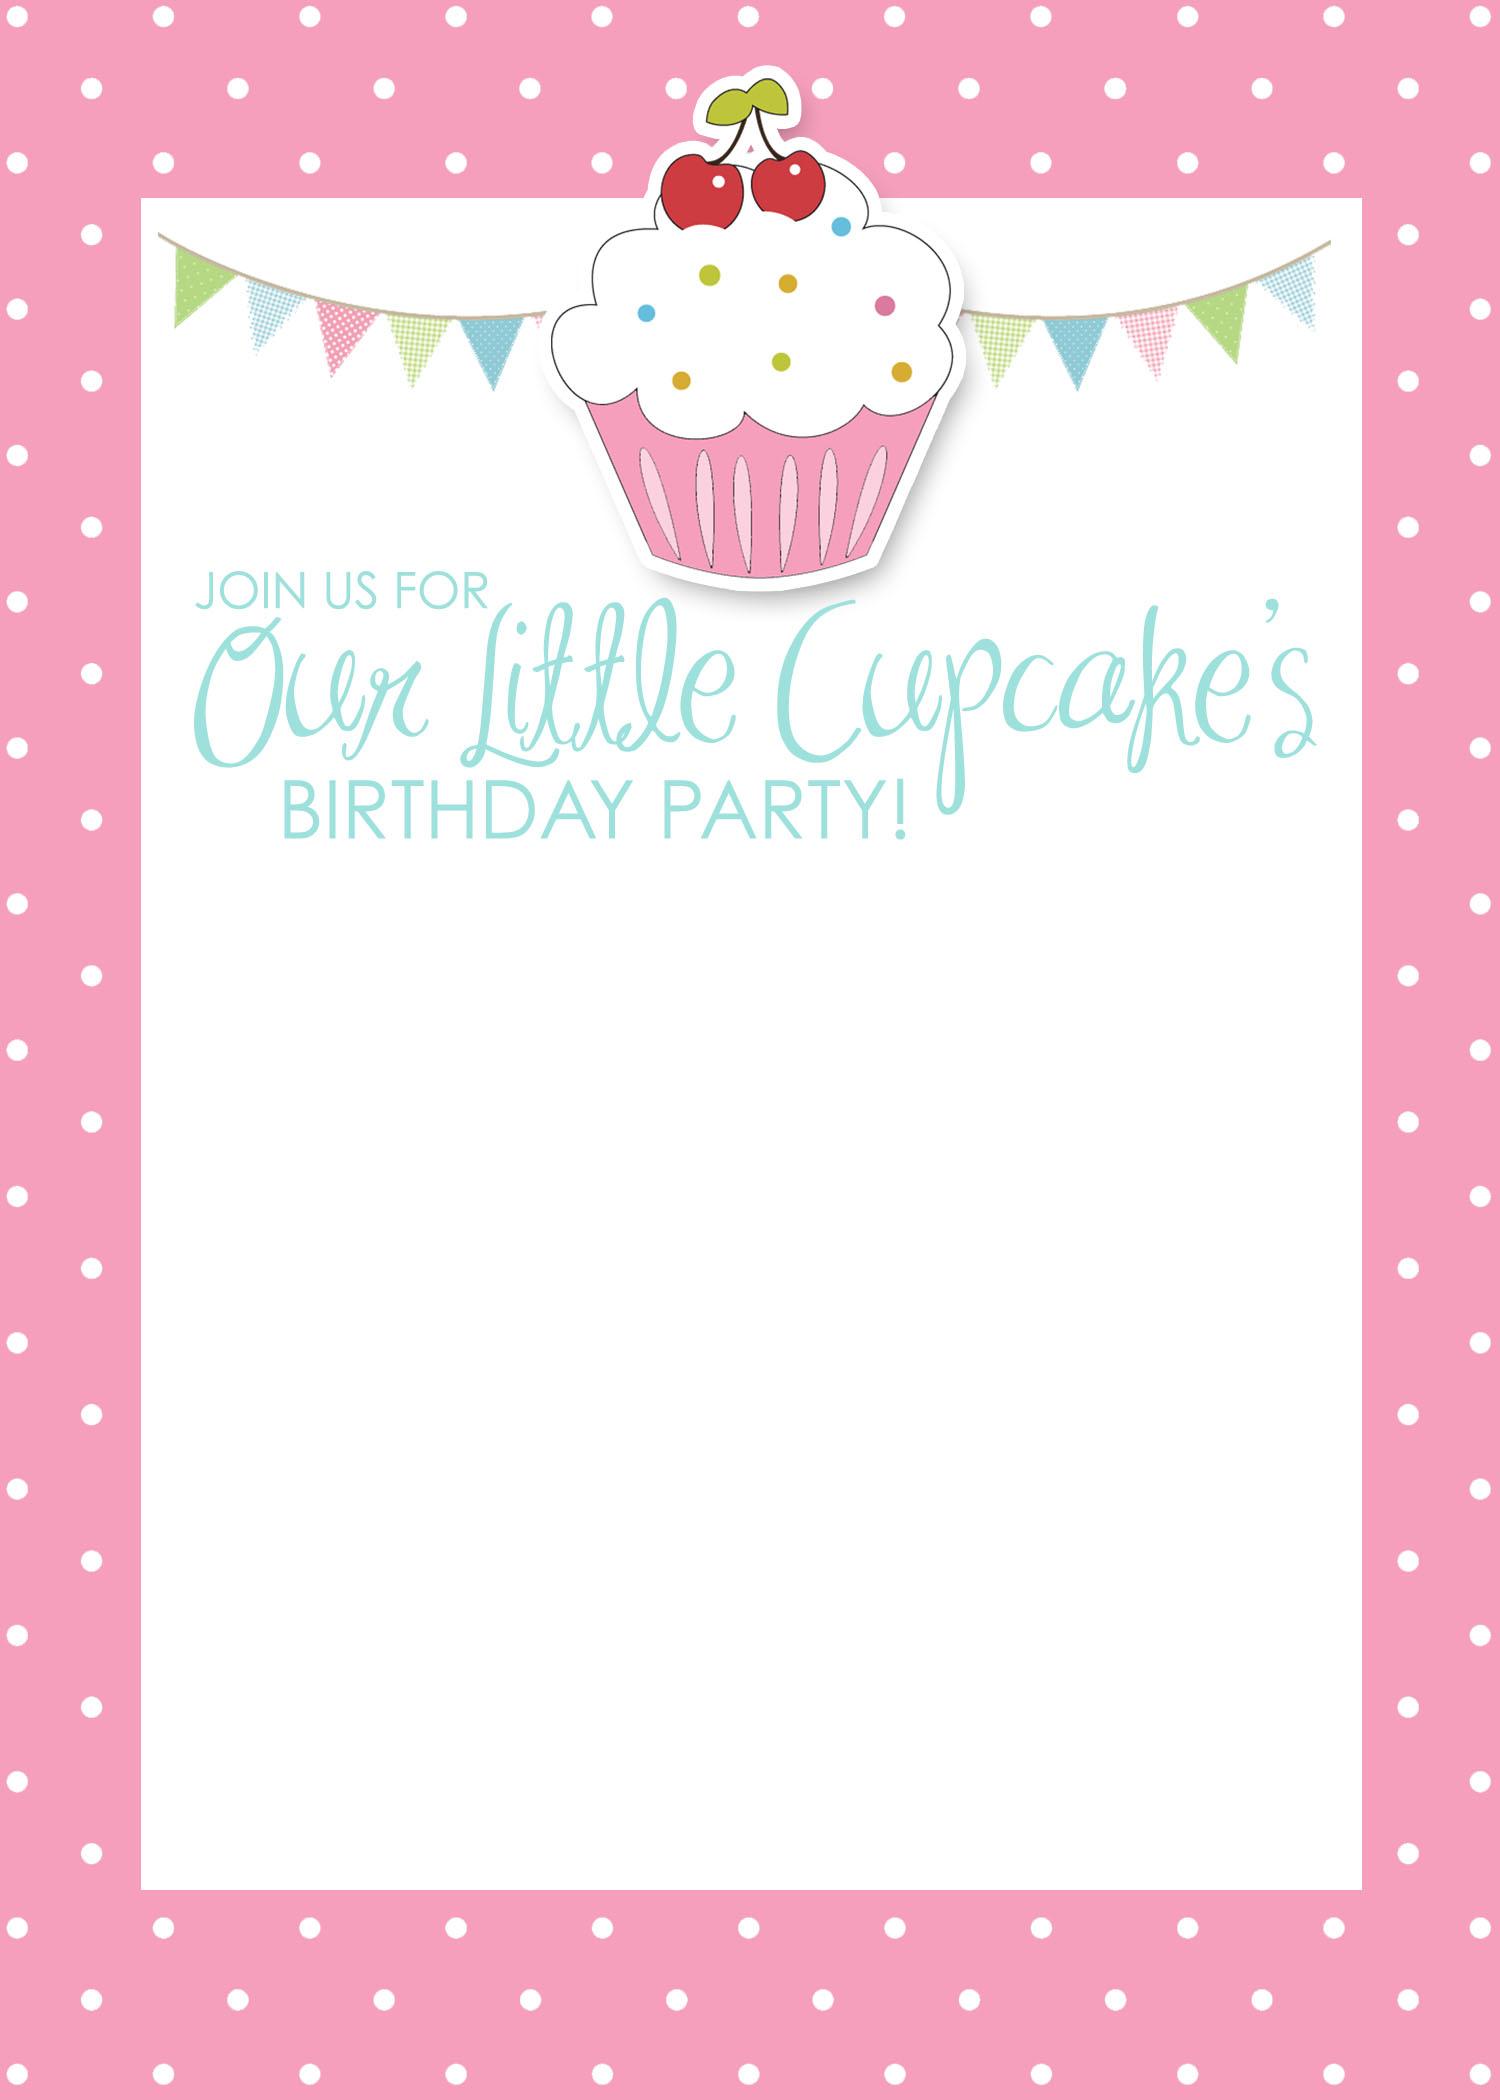 5 Images of Free Printable Birthday Cupcake Invitations